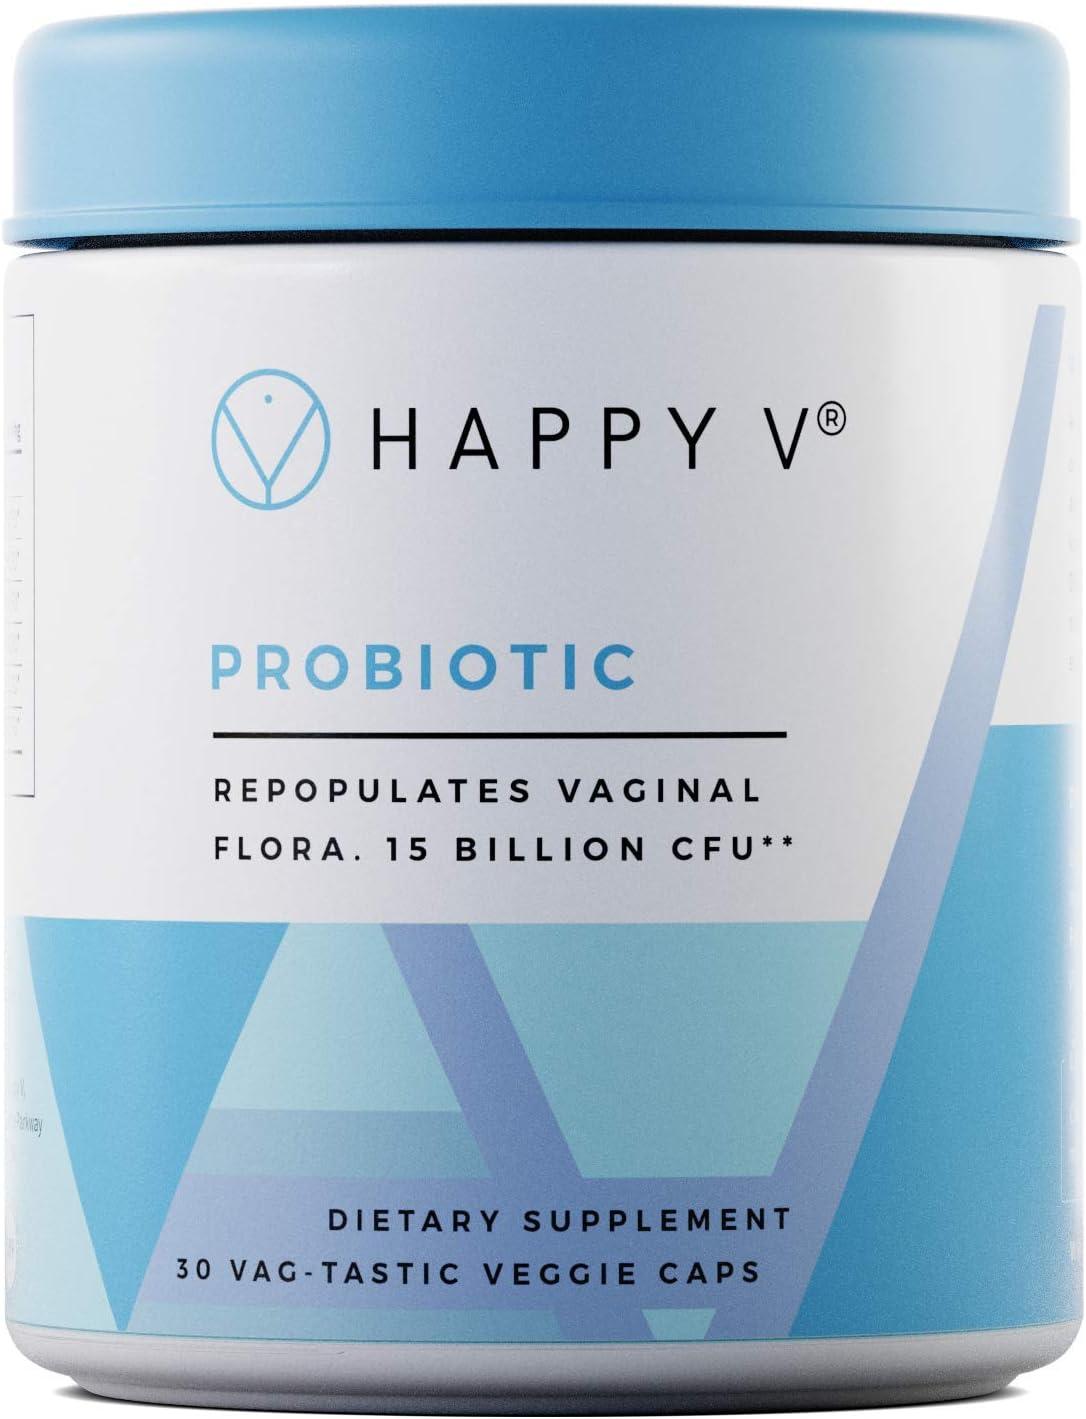 Happy V Probiotic - Patented Profem Lactobacillus Acidophilus Capsules for Women - 15 Billion CFU for Bacterial Vaginosis - Compatible with Cranberry and Prebiotic Pills - Restore Vaginal Balance